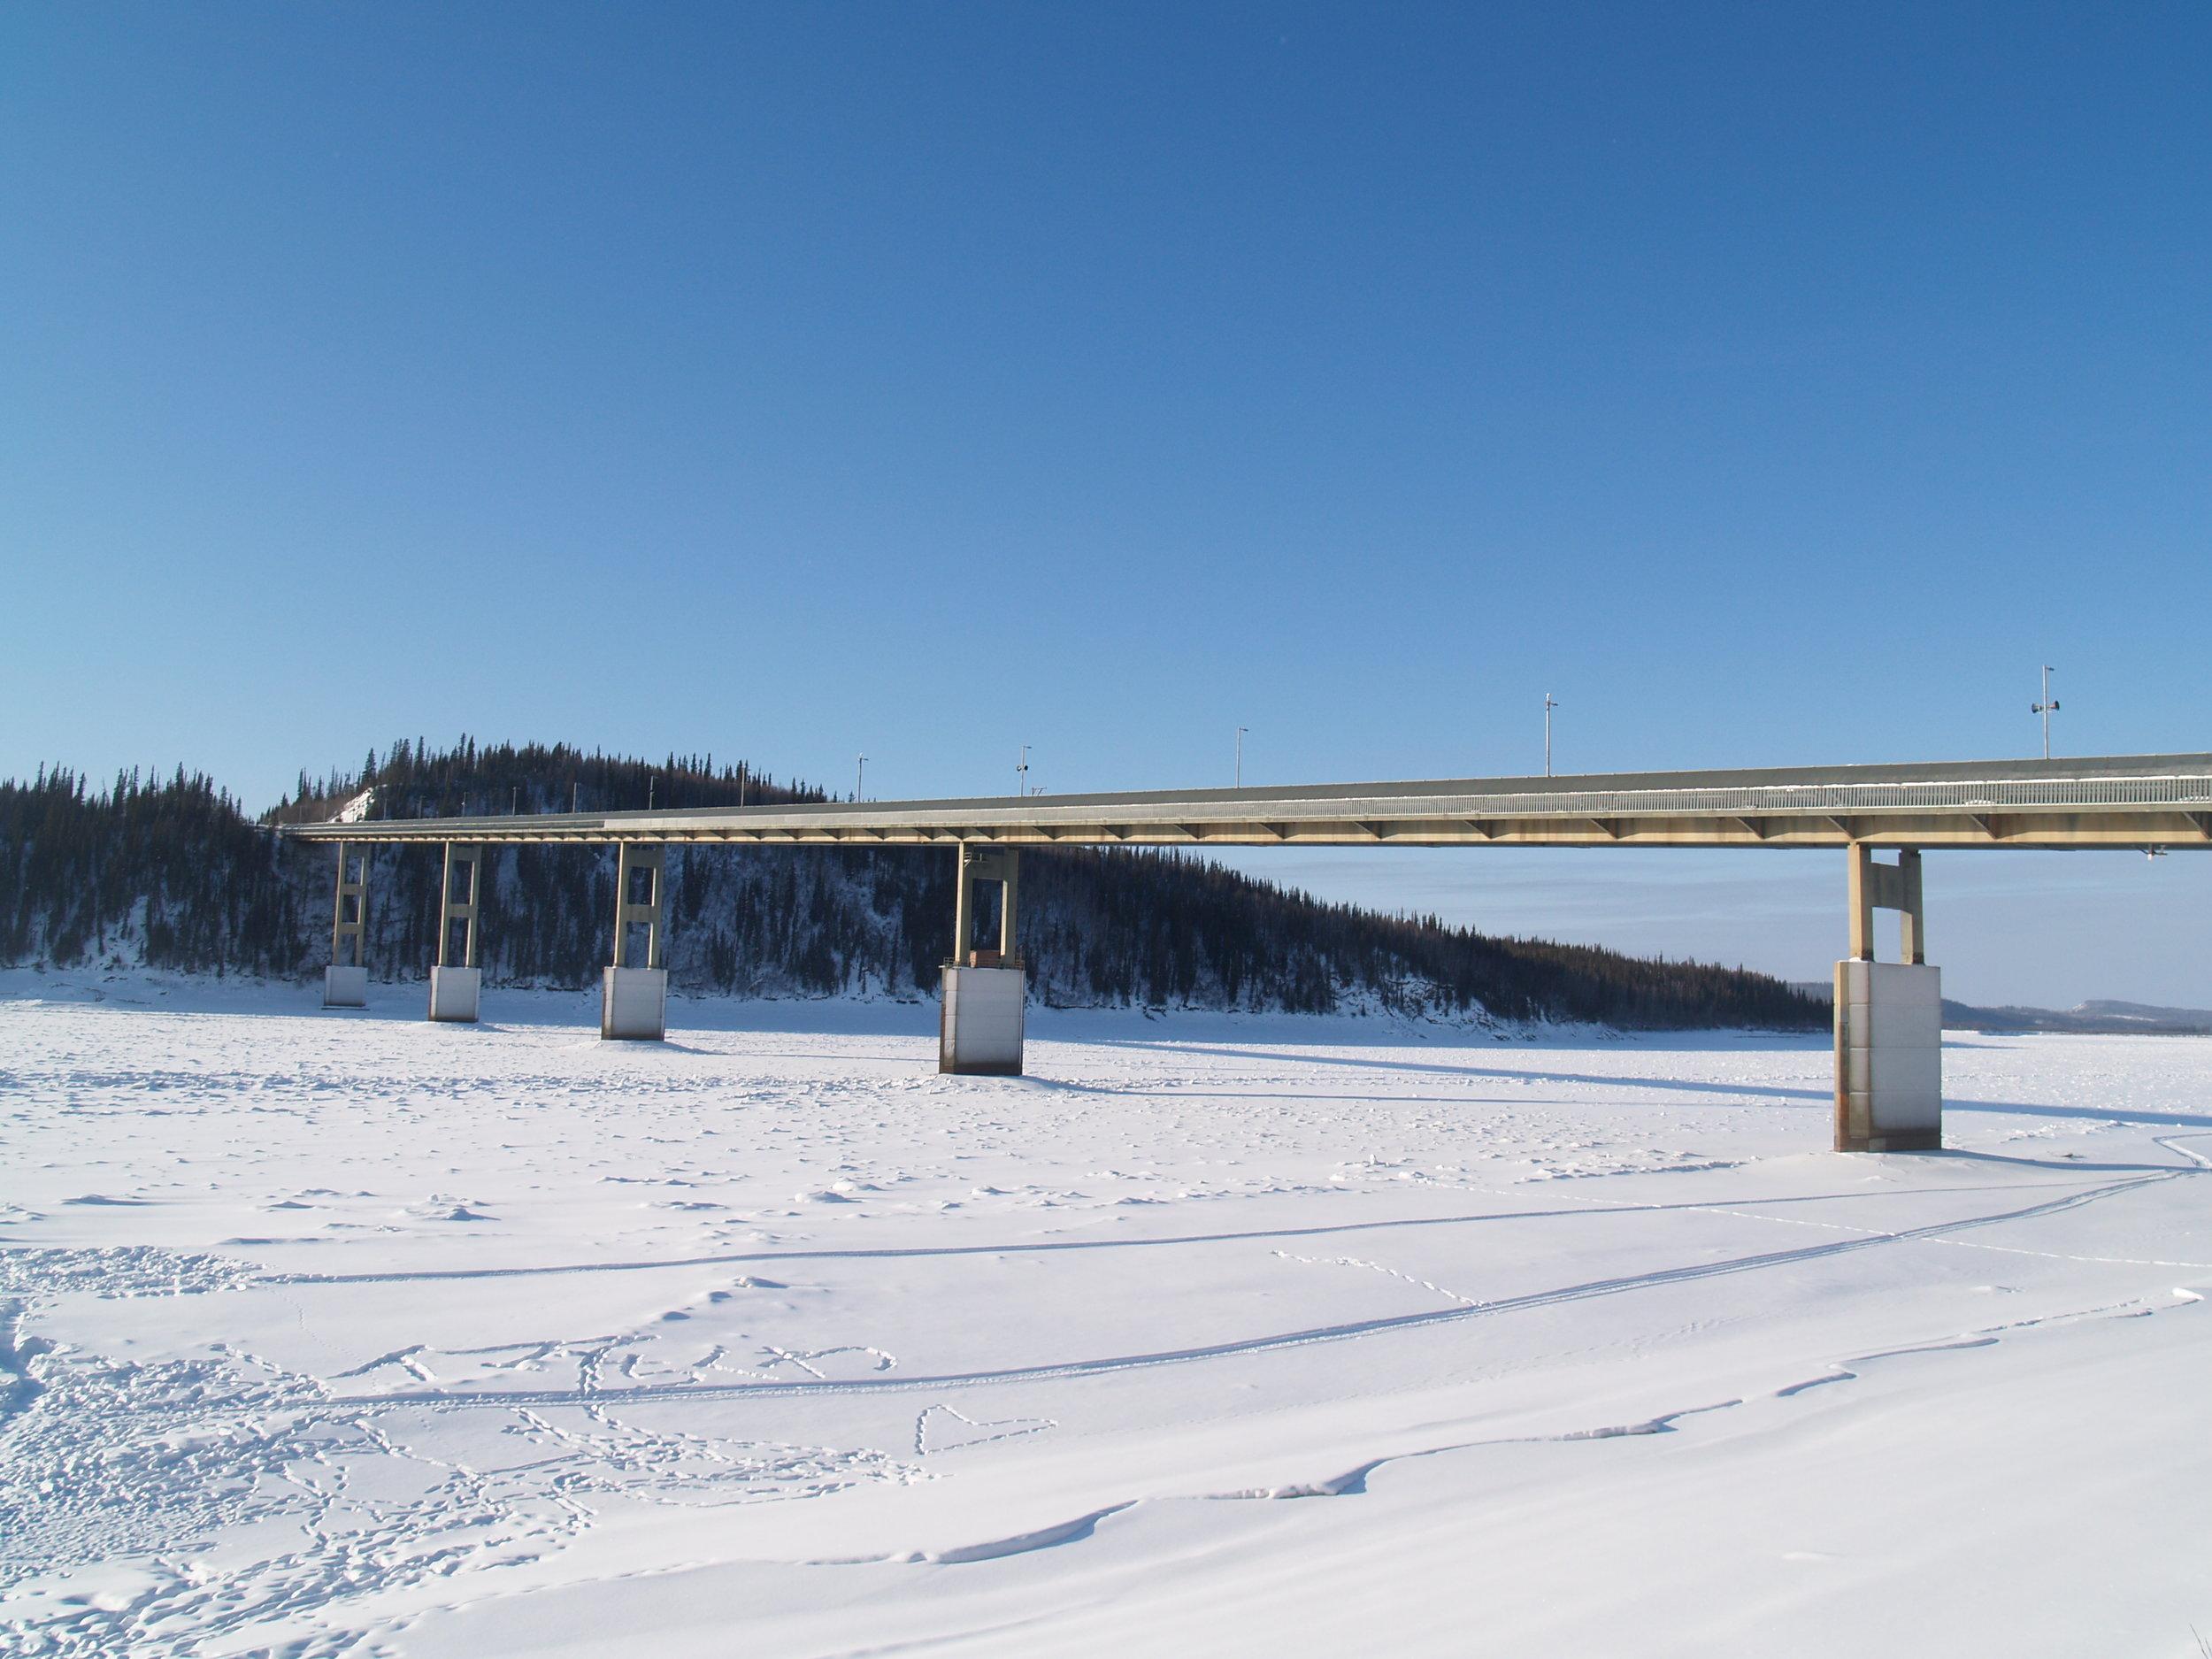 YR - bridge in winter - 2010.JPG